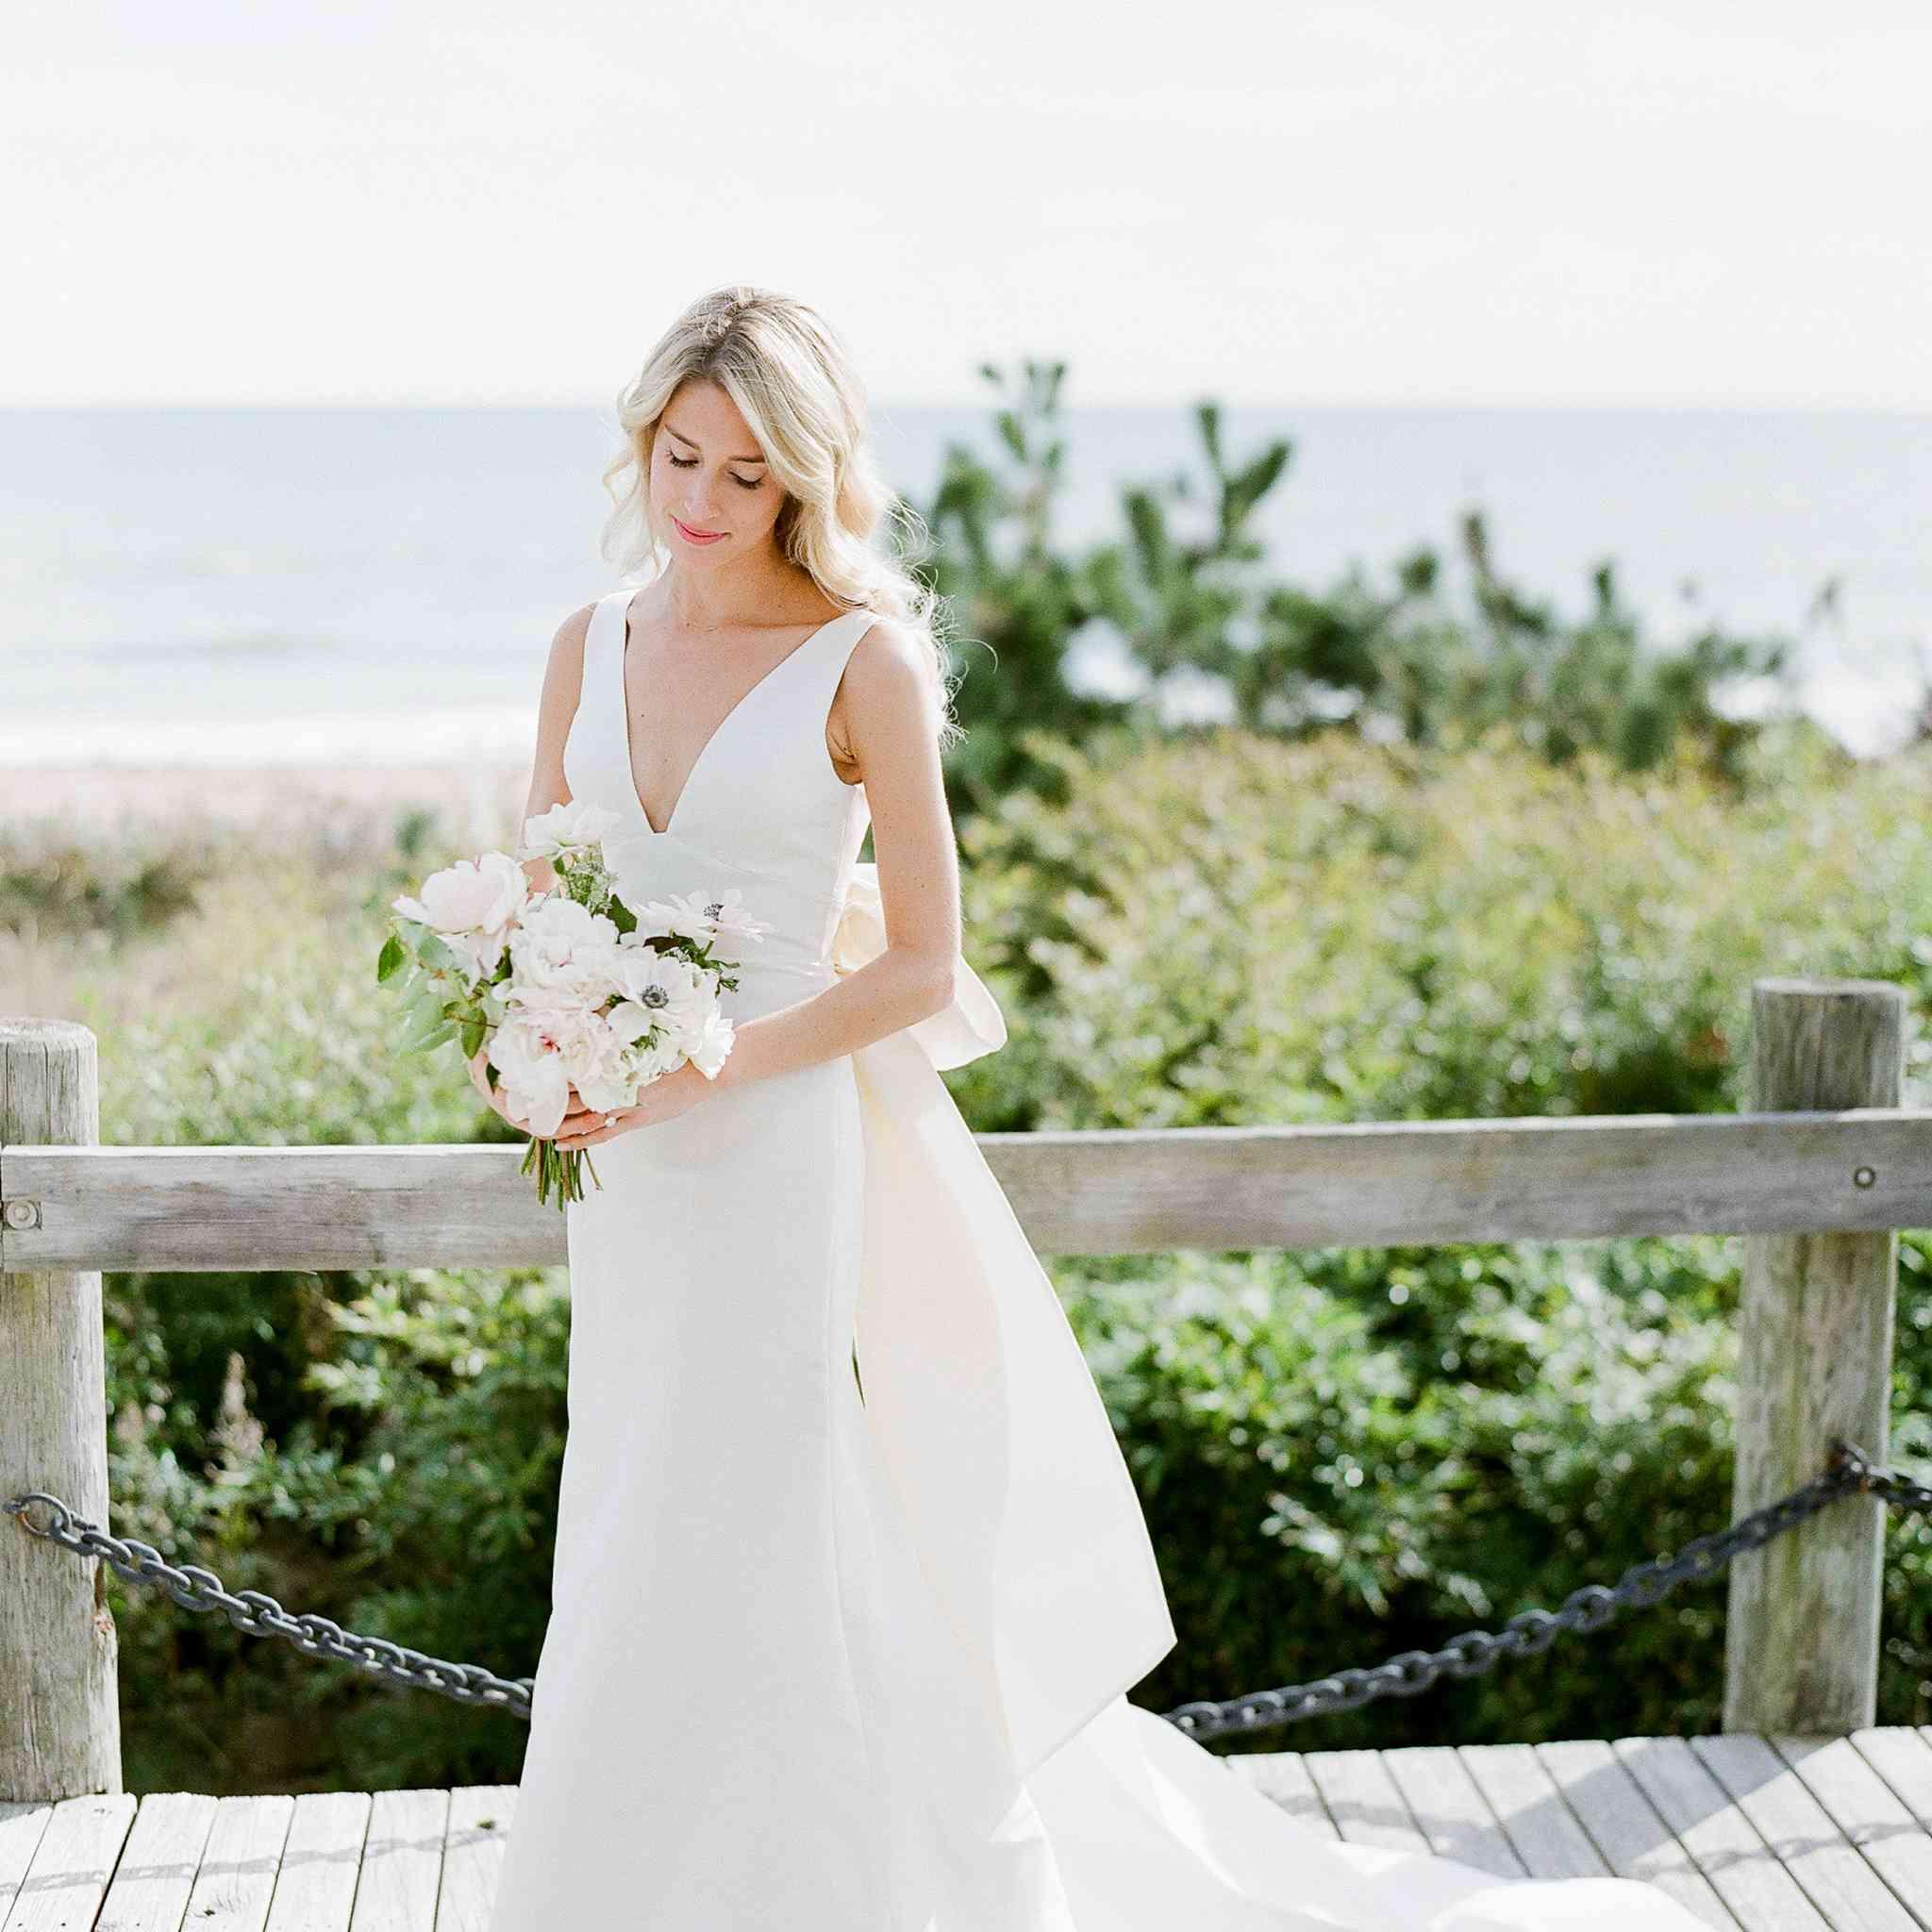 <p>bride trumpet wedding dress on dock</p><br><br>